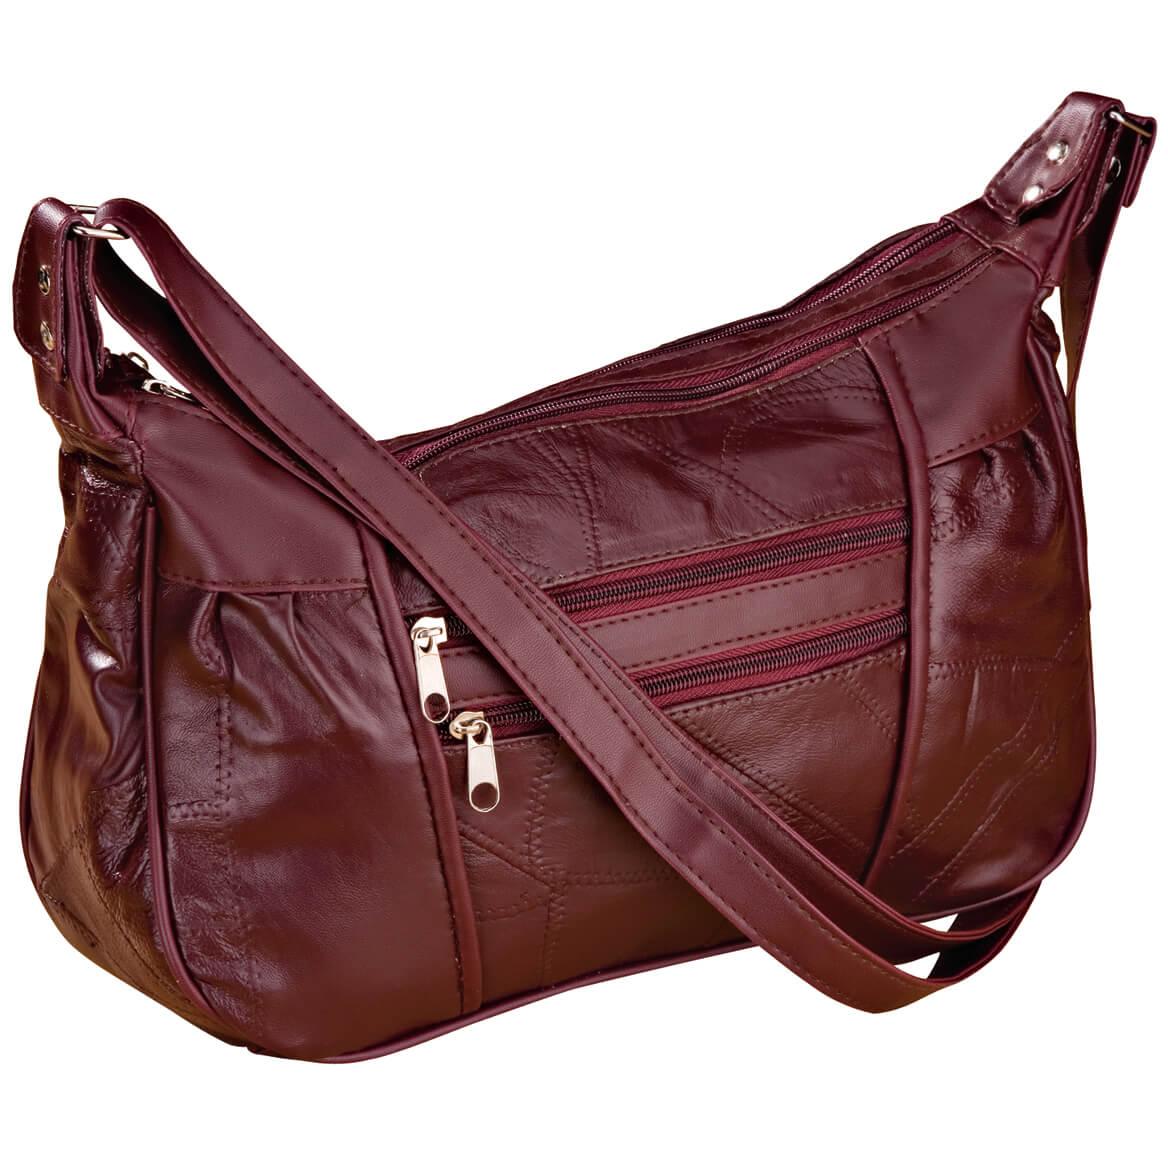 Burgundy Patch Leather Handbag-339981